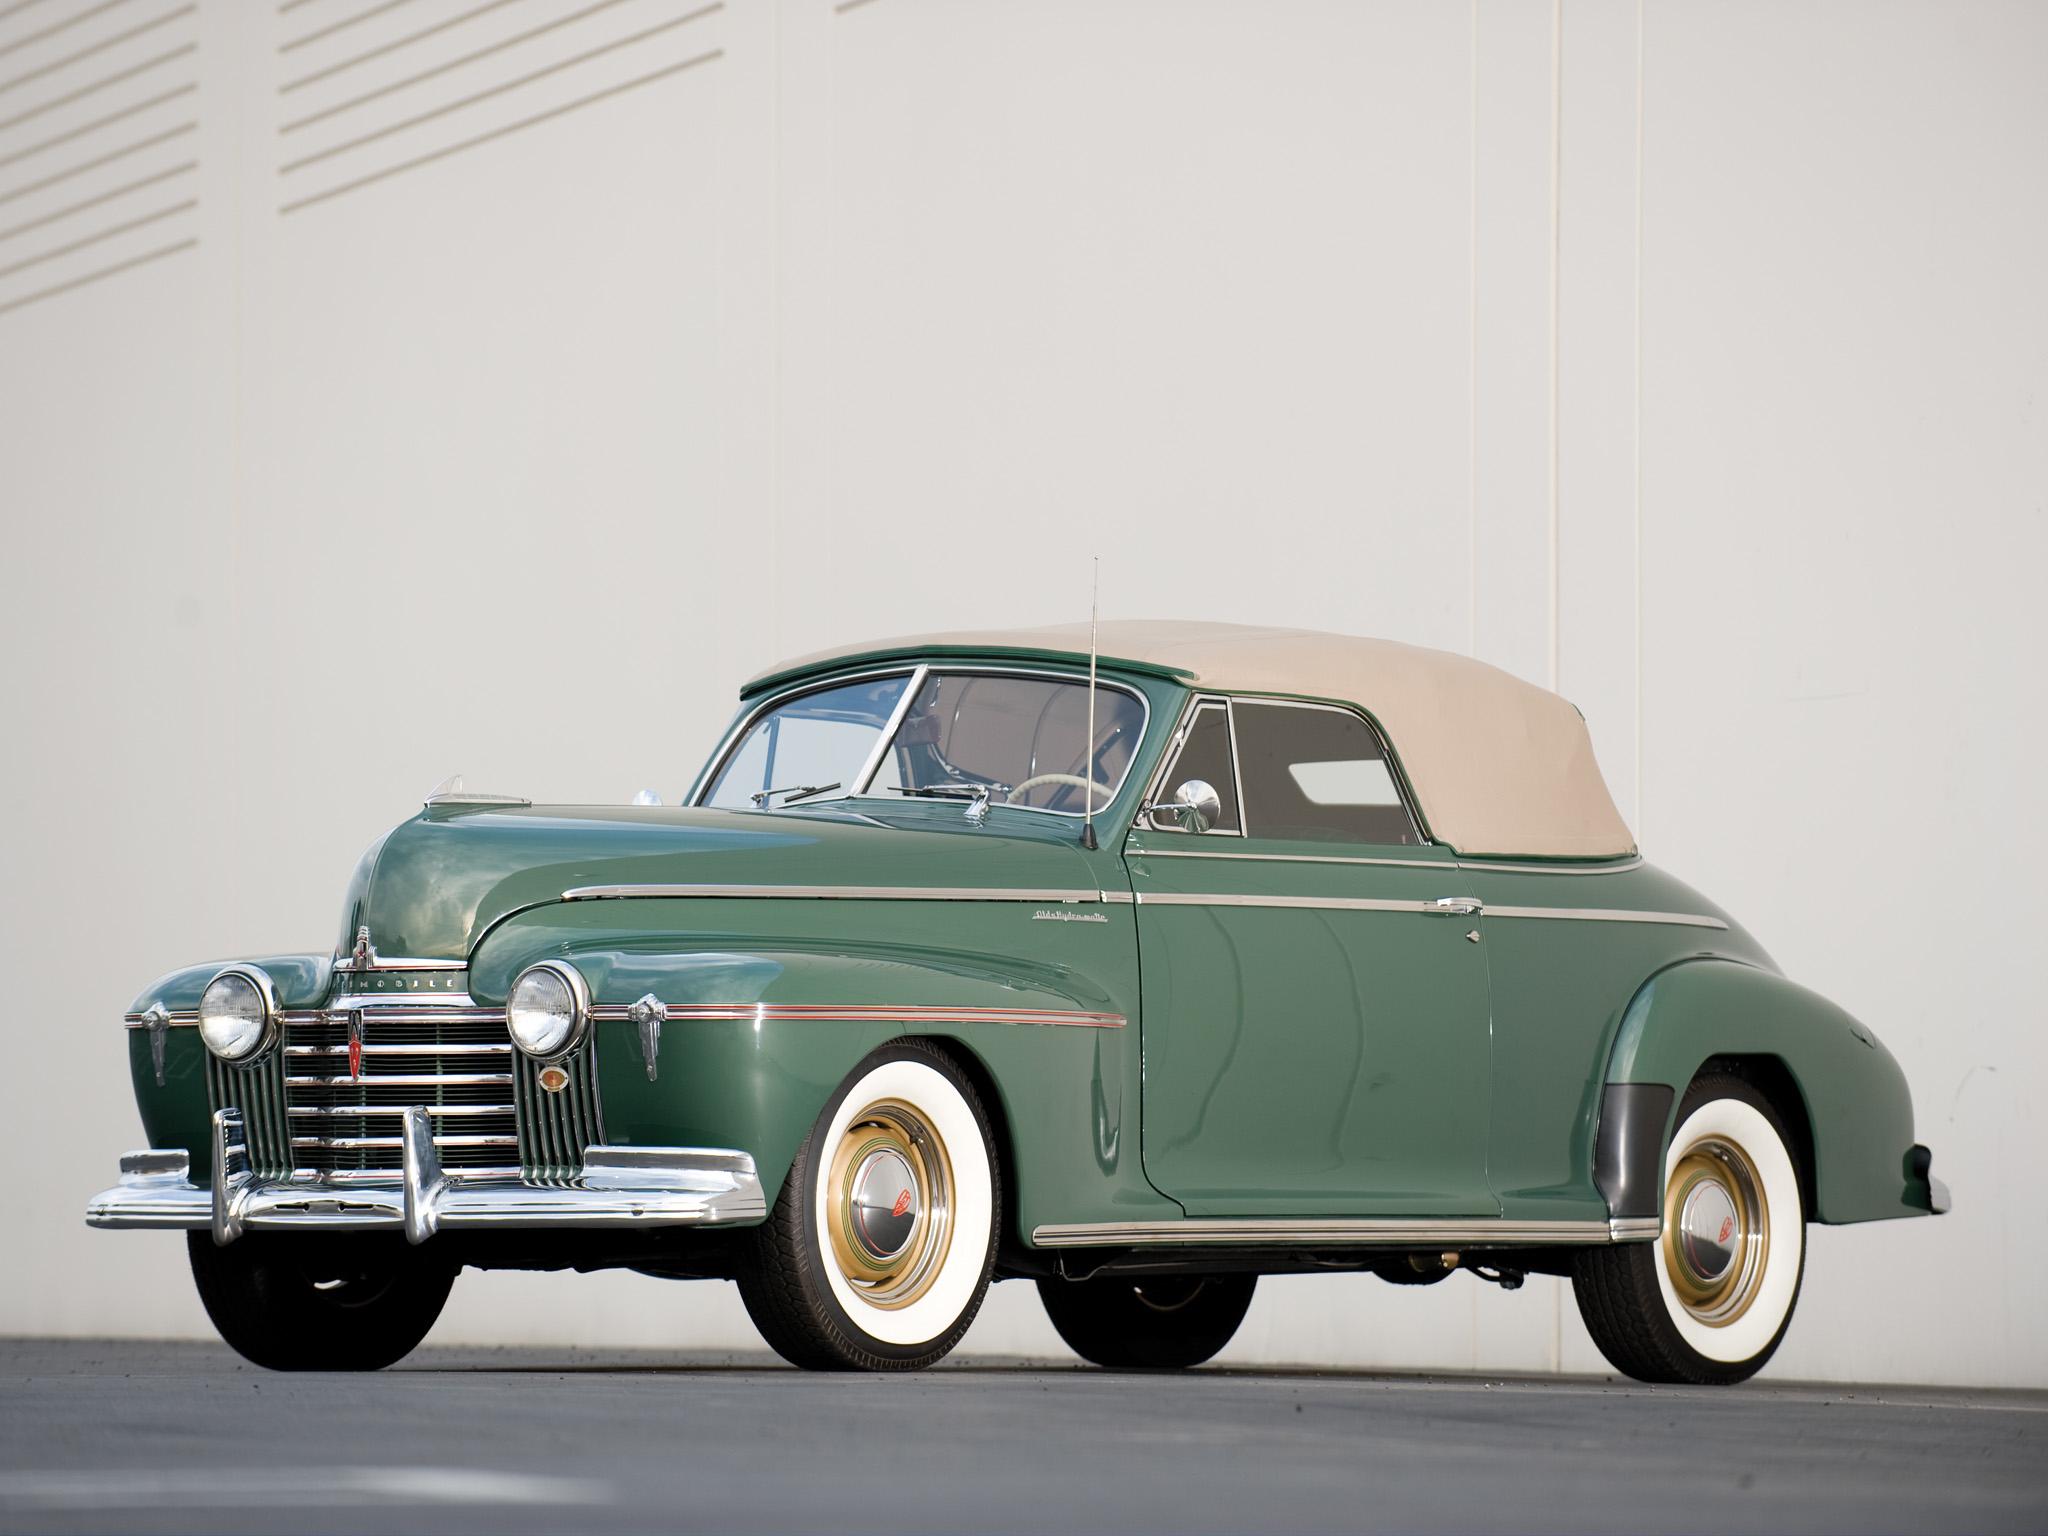 1941 Oldsmobile Special 66 Convertible 3567 Retro Wallpaper 2048x1536 164297 Wallpaperup